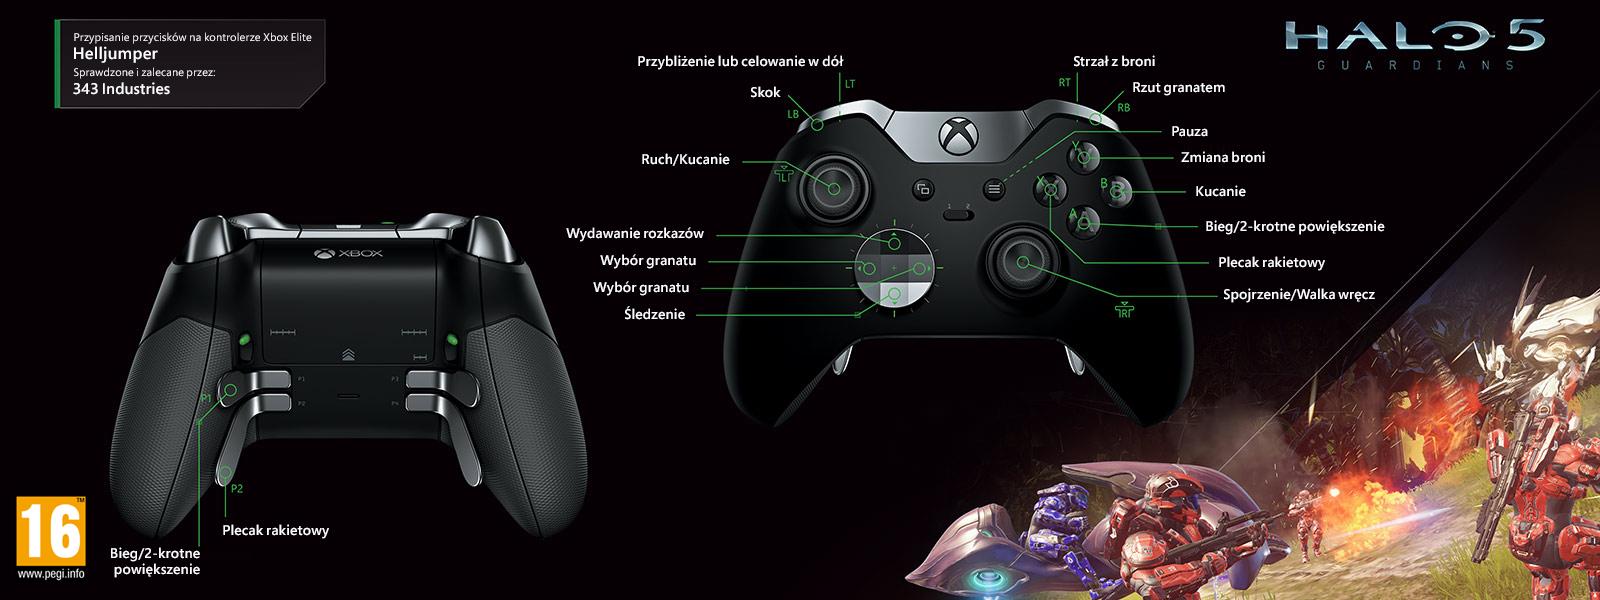 Halo 5 – mapowanie Elite pod kątem trybu Helljumper